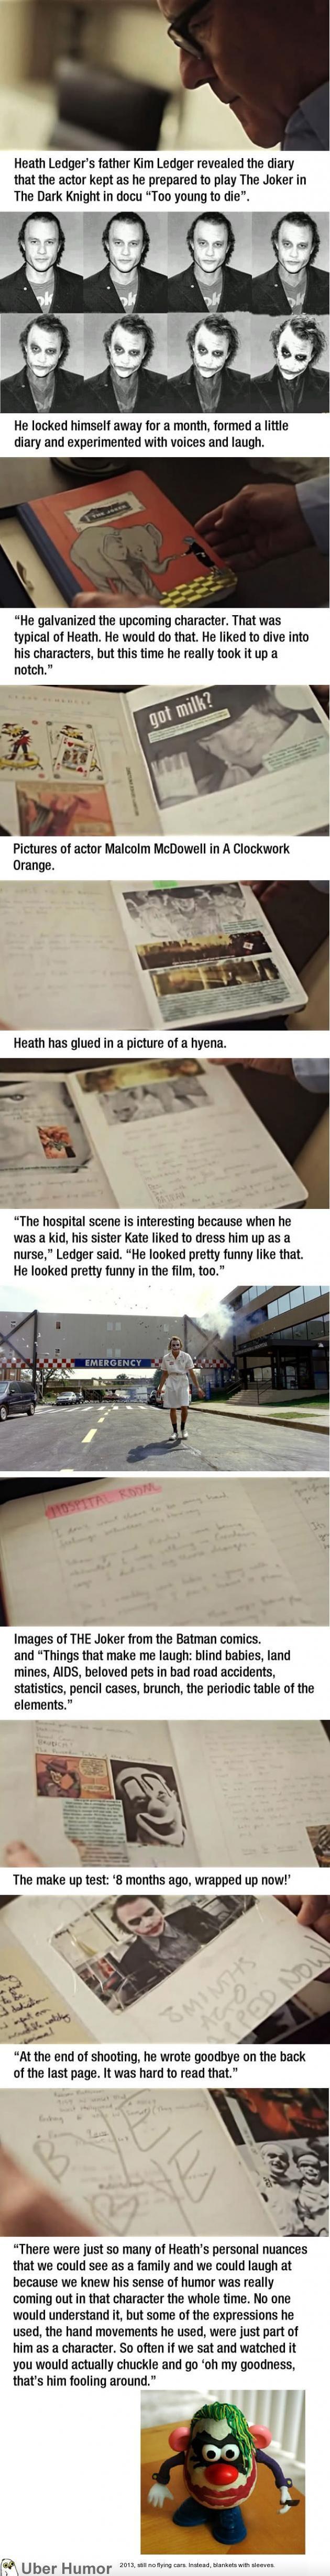 cool Heath Ledger's joker diary Check more at https://10ztalk.com/2017/01/24/heath-ledgers-joker-diary/